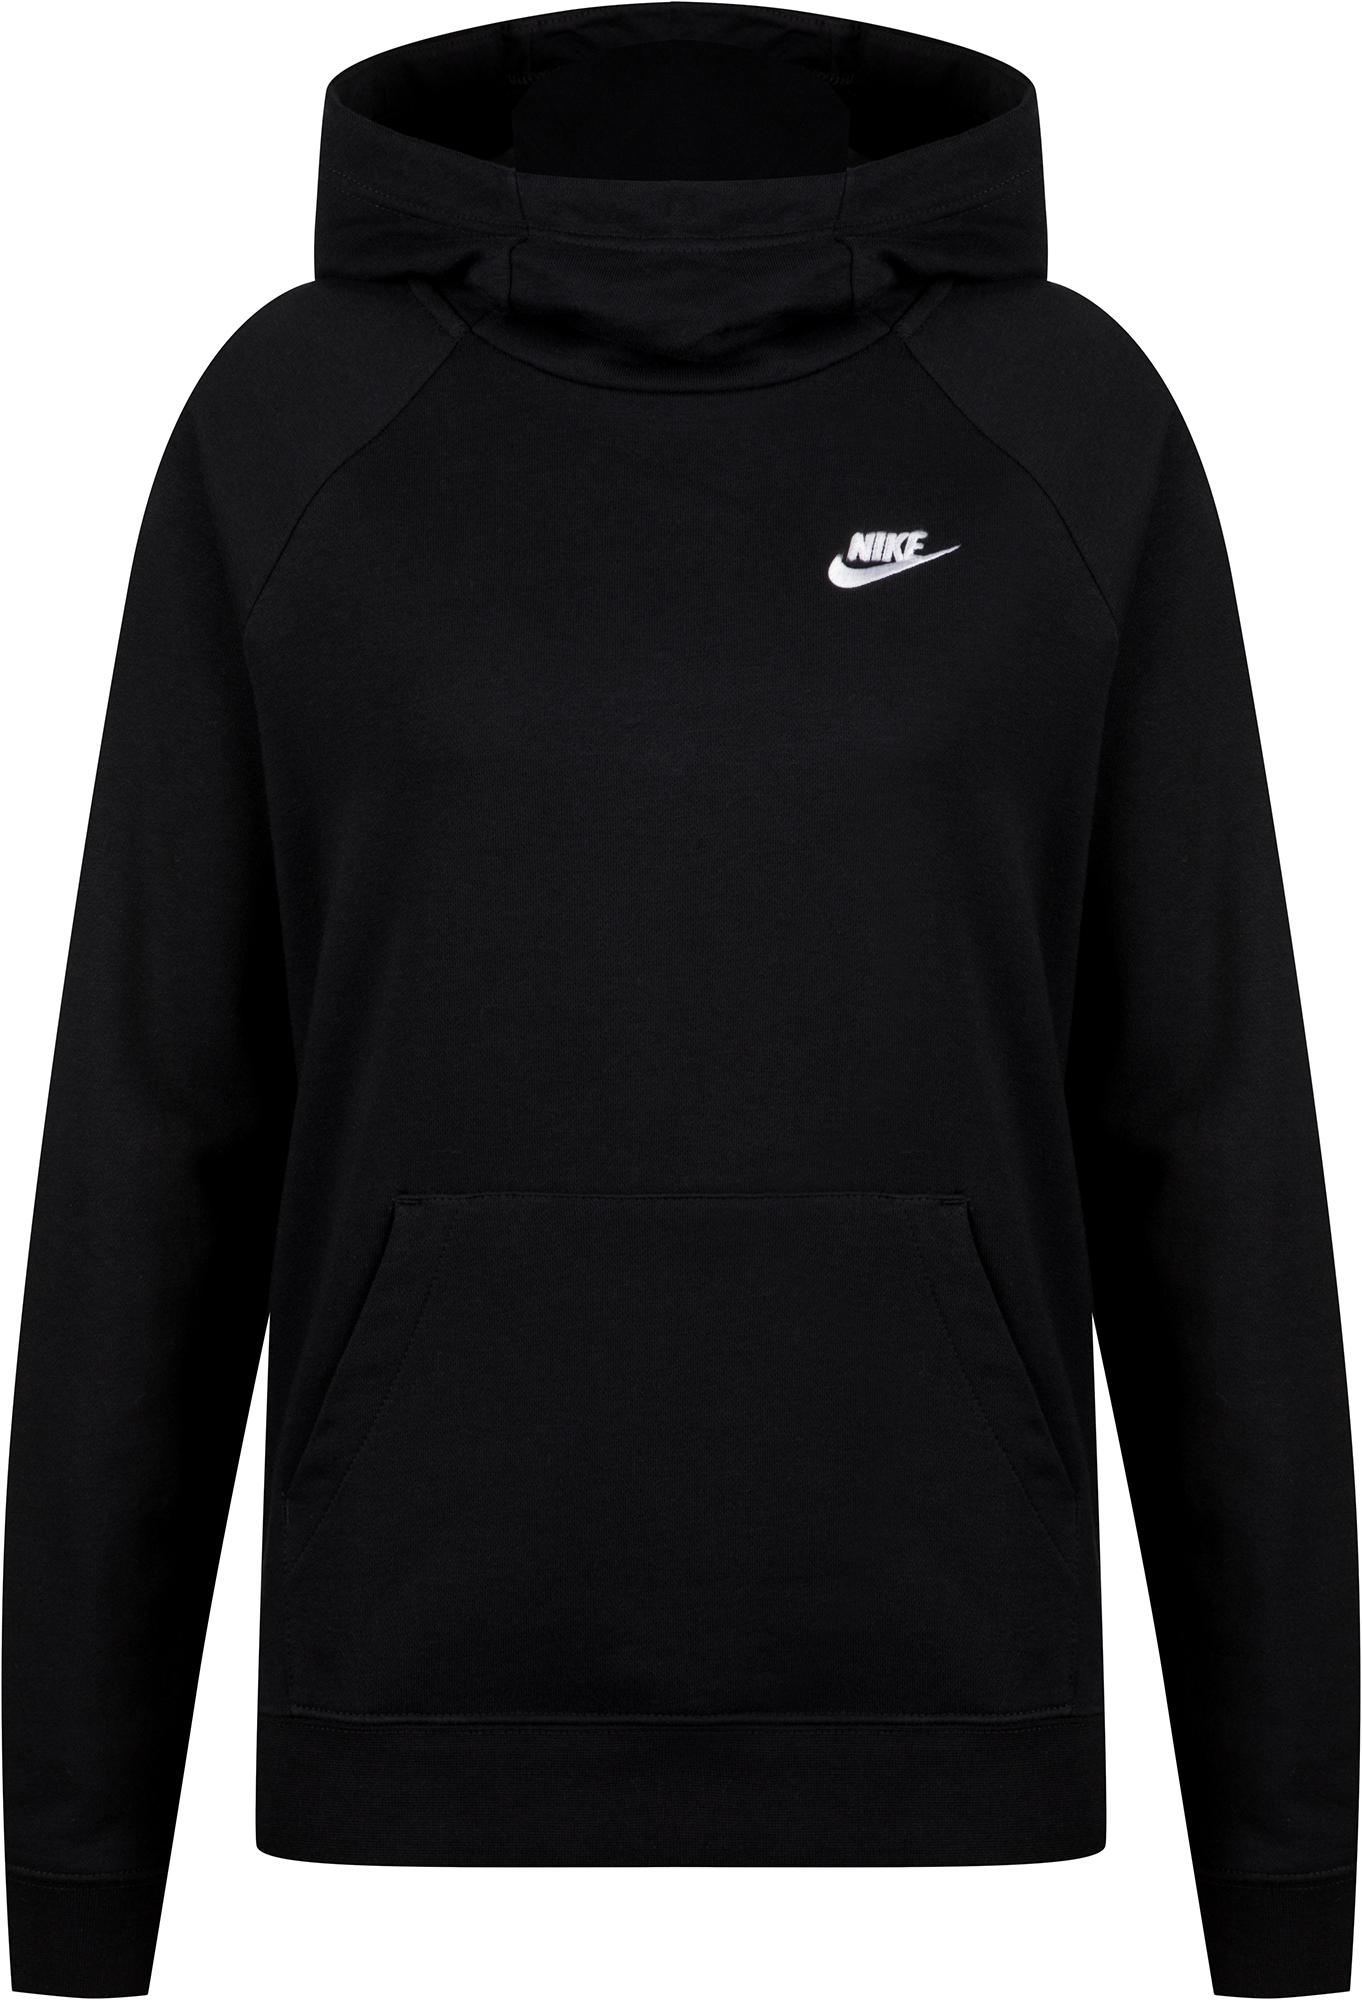 цена Nike Худи женская Nike Sportswear Essential, размер 42-44 онлайн в 2017 году